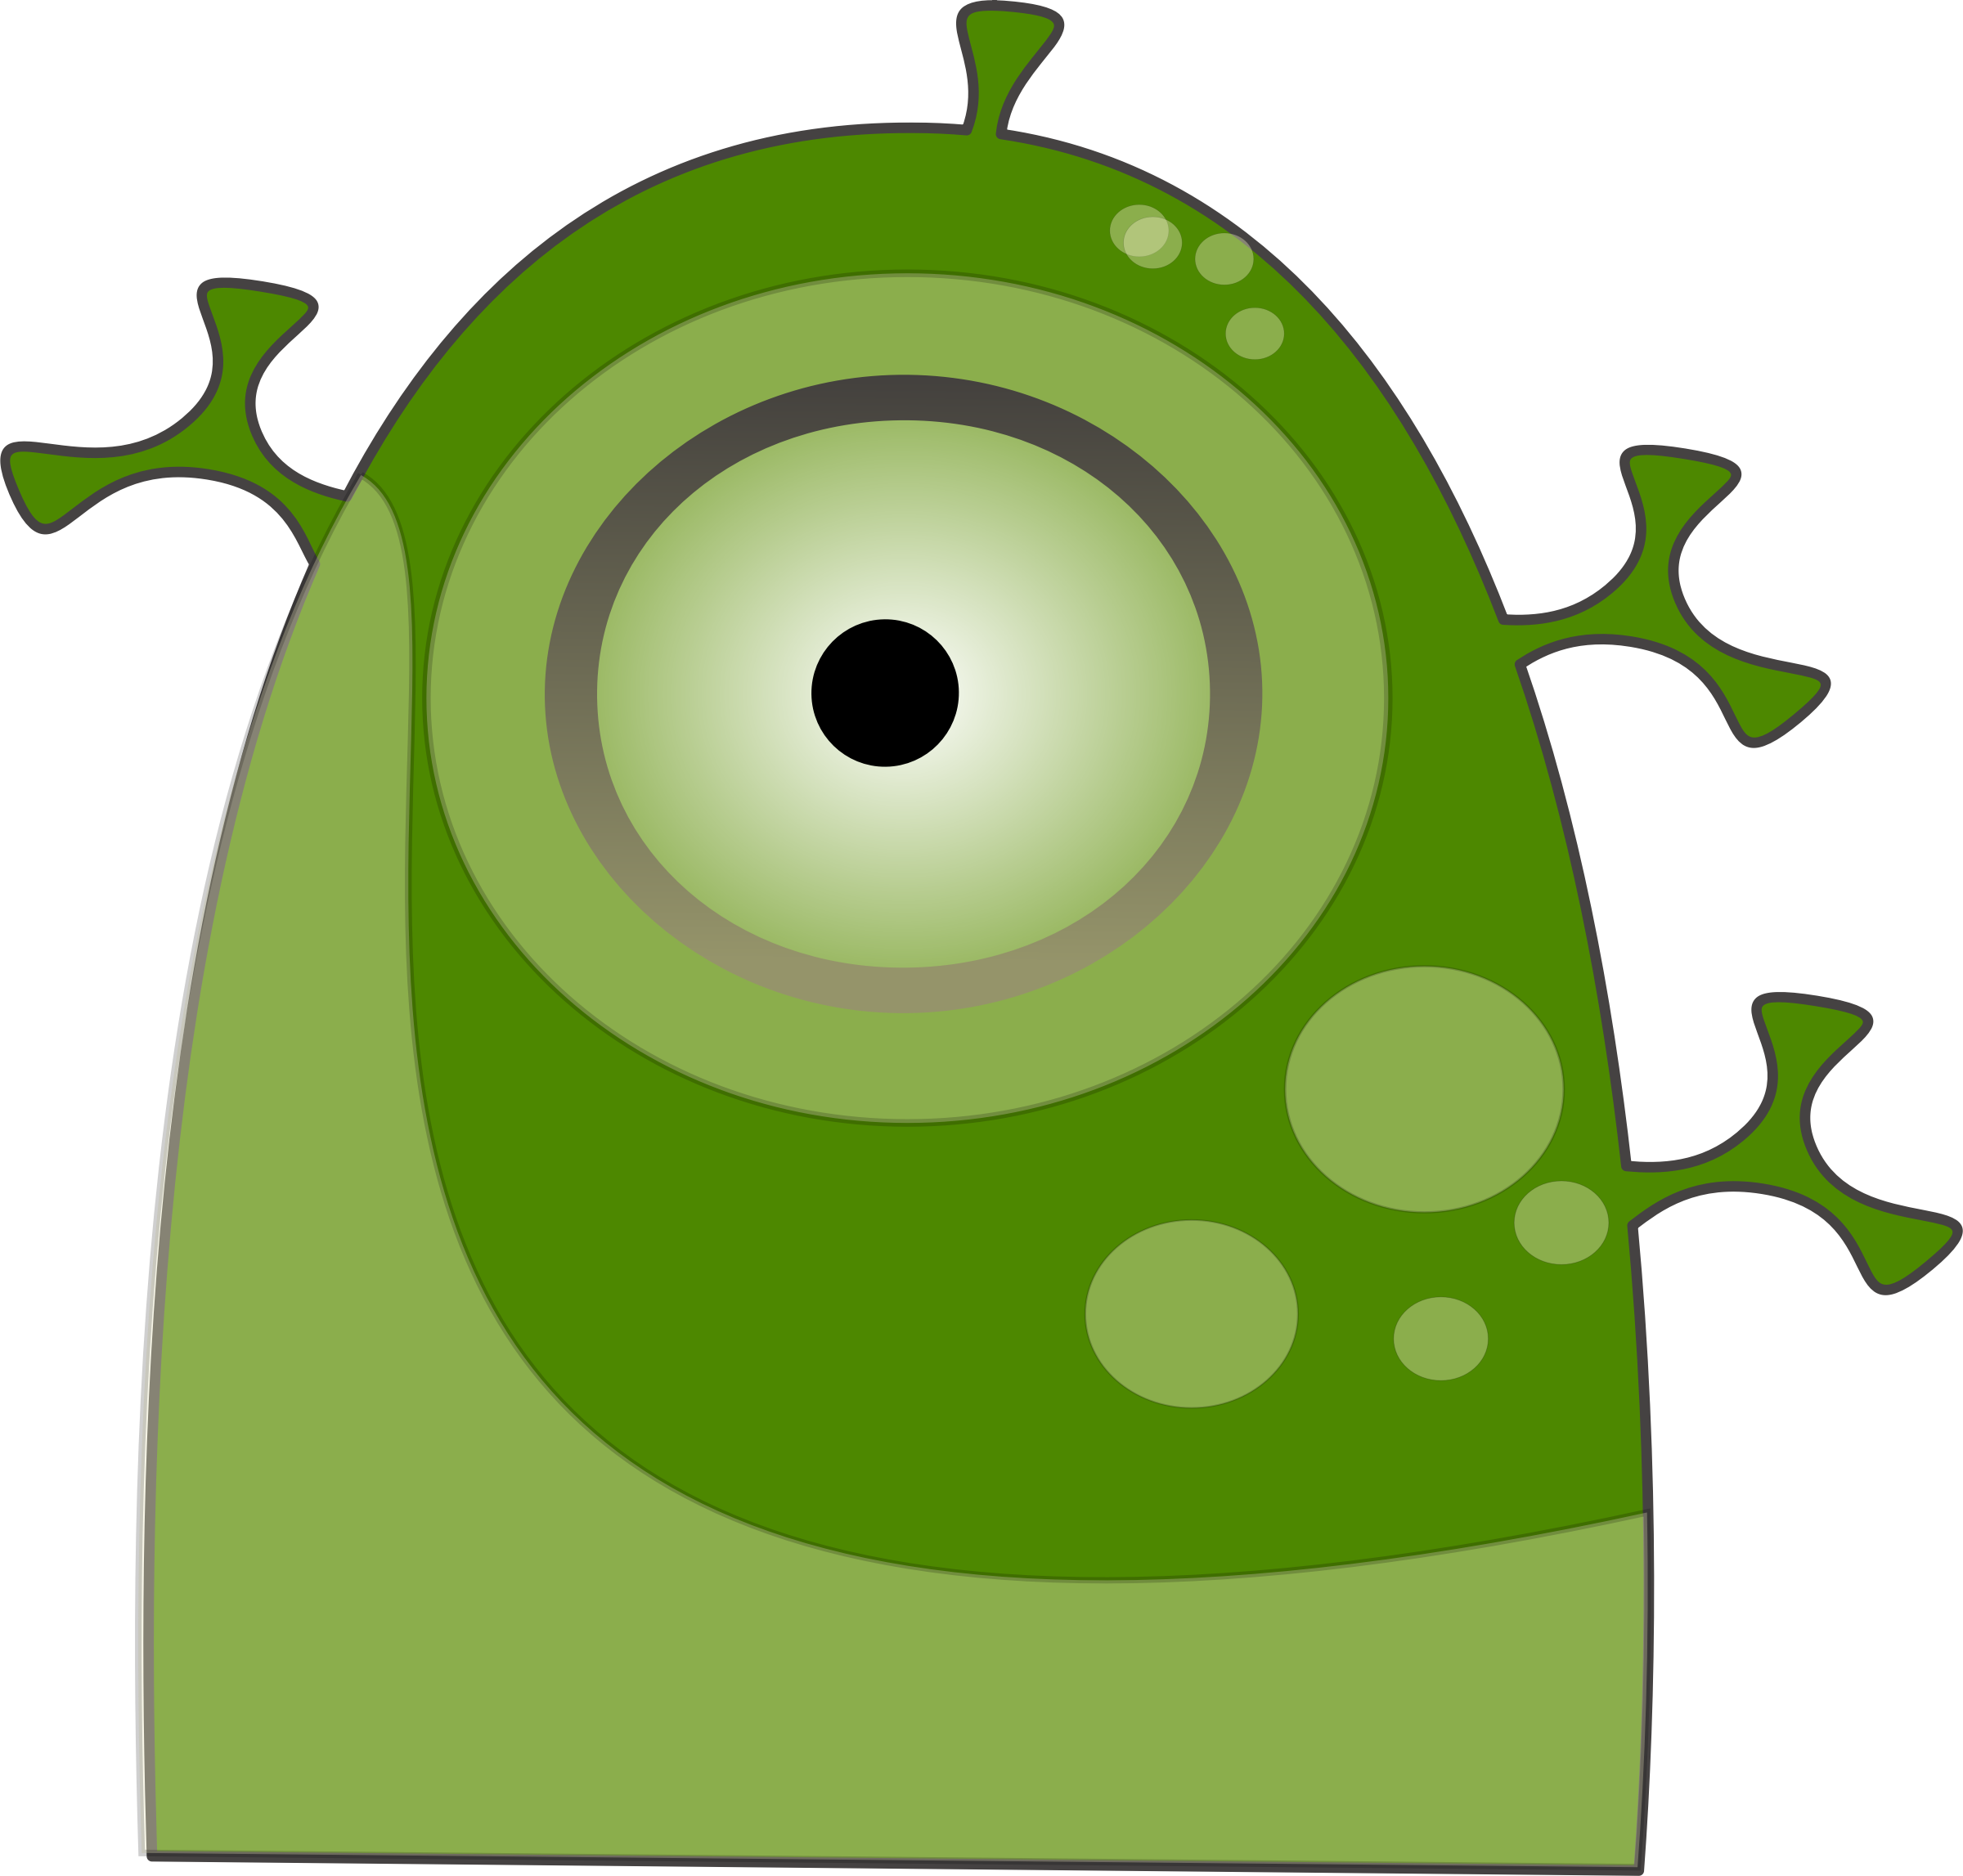 Big image png. Clipart eye alien